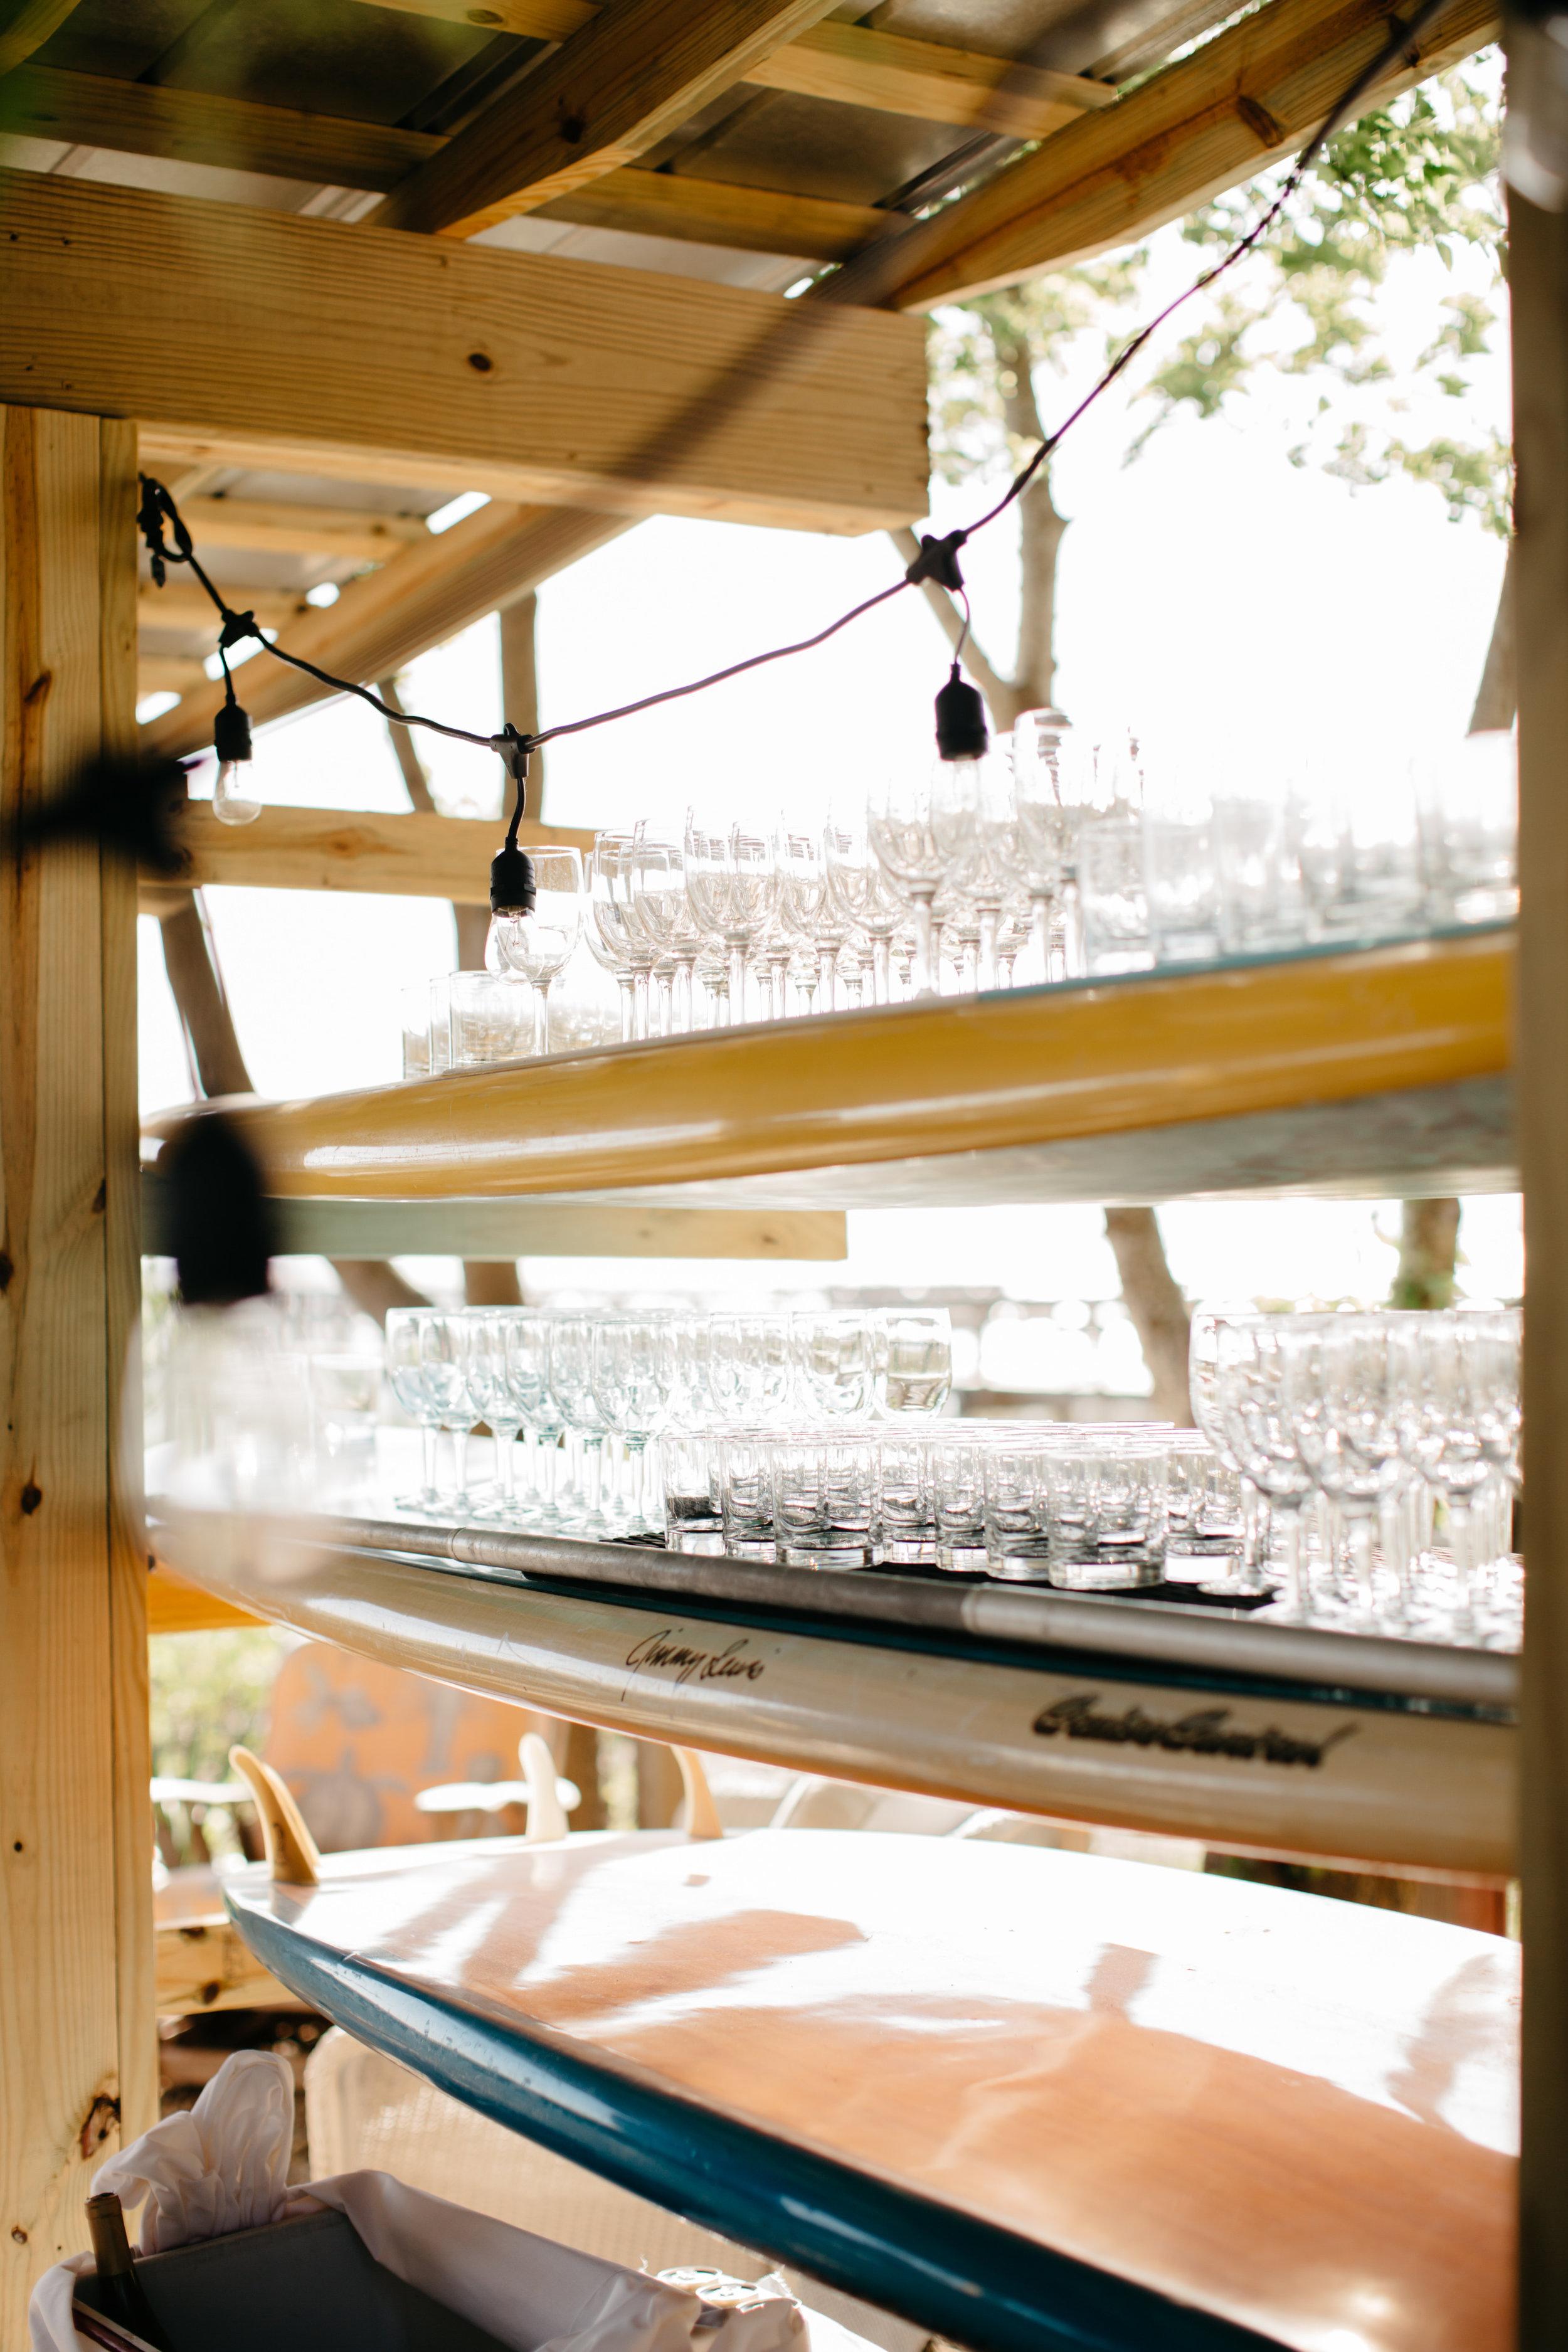 paraiso-event-design-charleston-mount-pleasant-waterfront-wedding-private-home-15.jpg